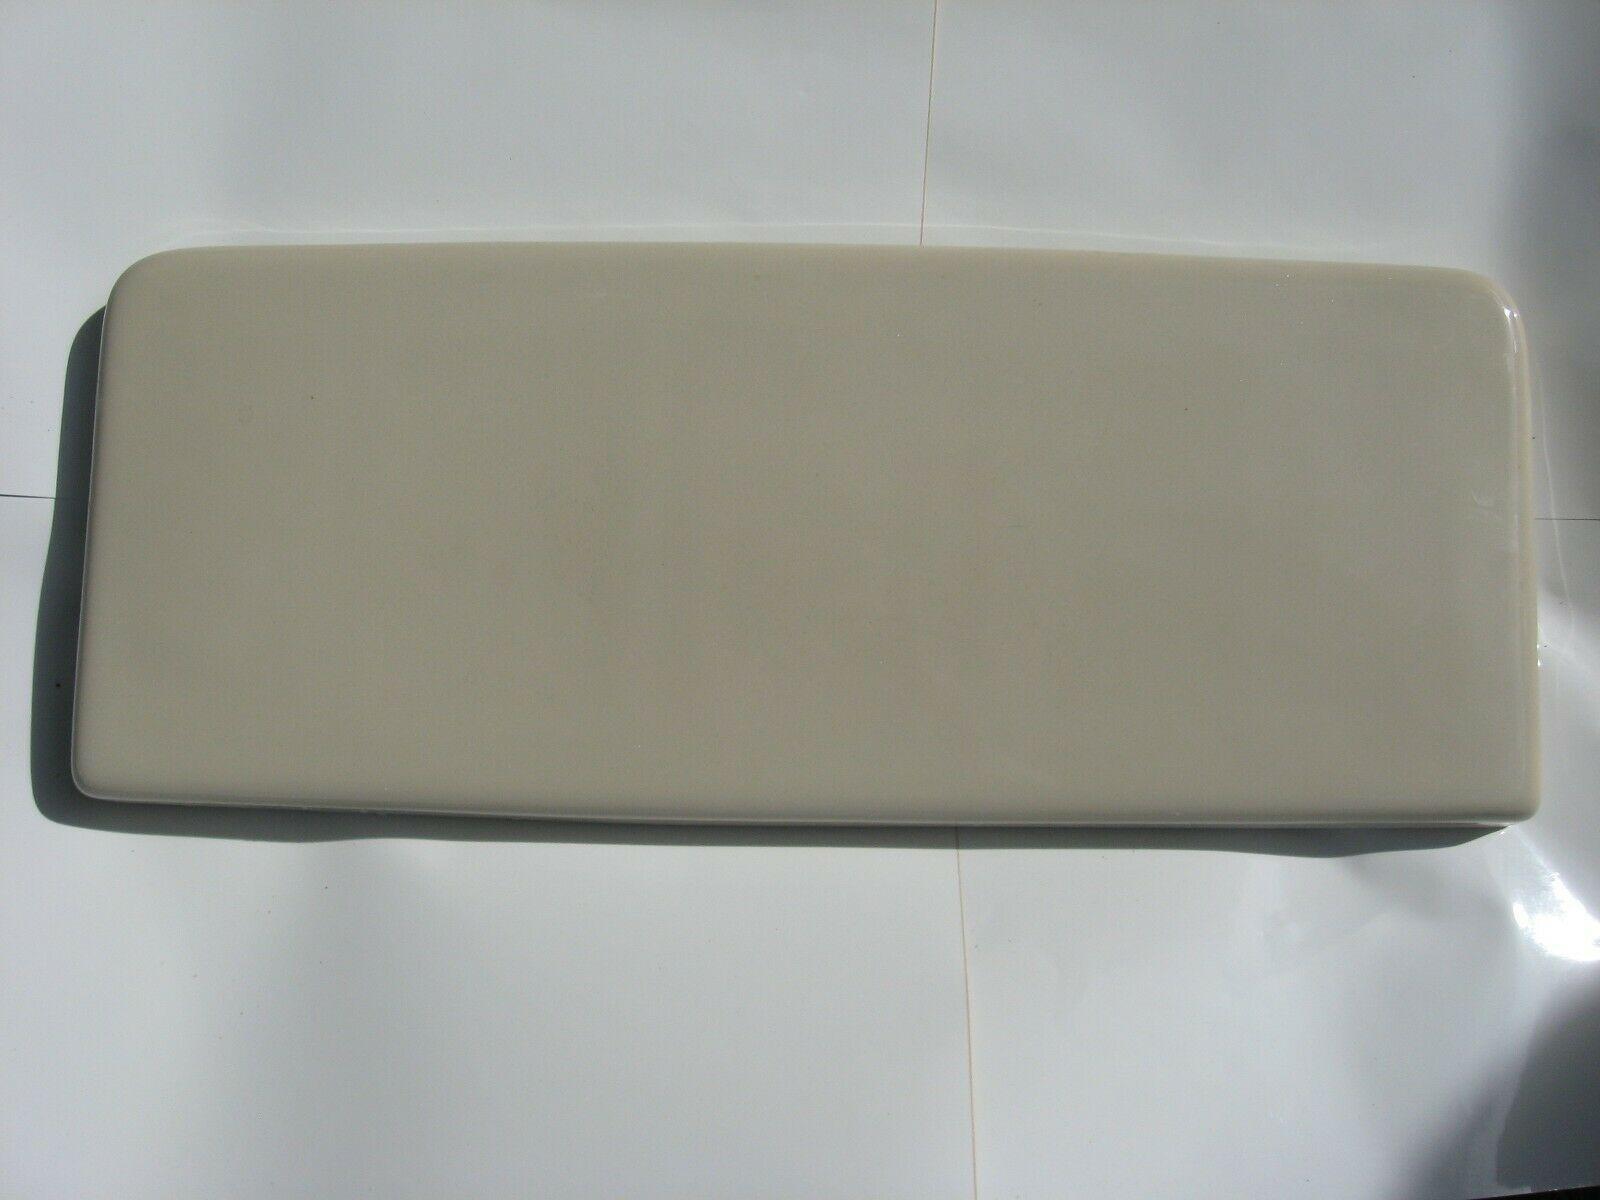 Kohler parchment dark almond toilet tank lid k4556 k